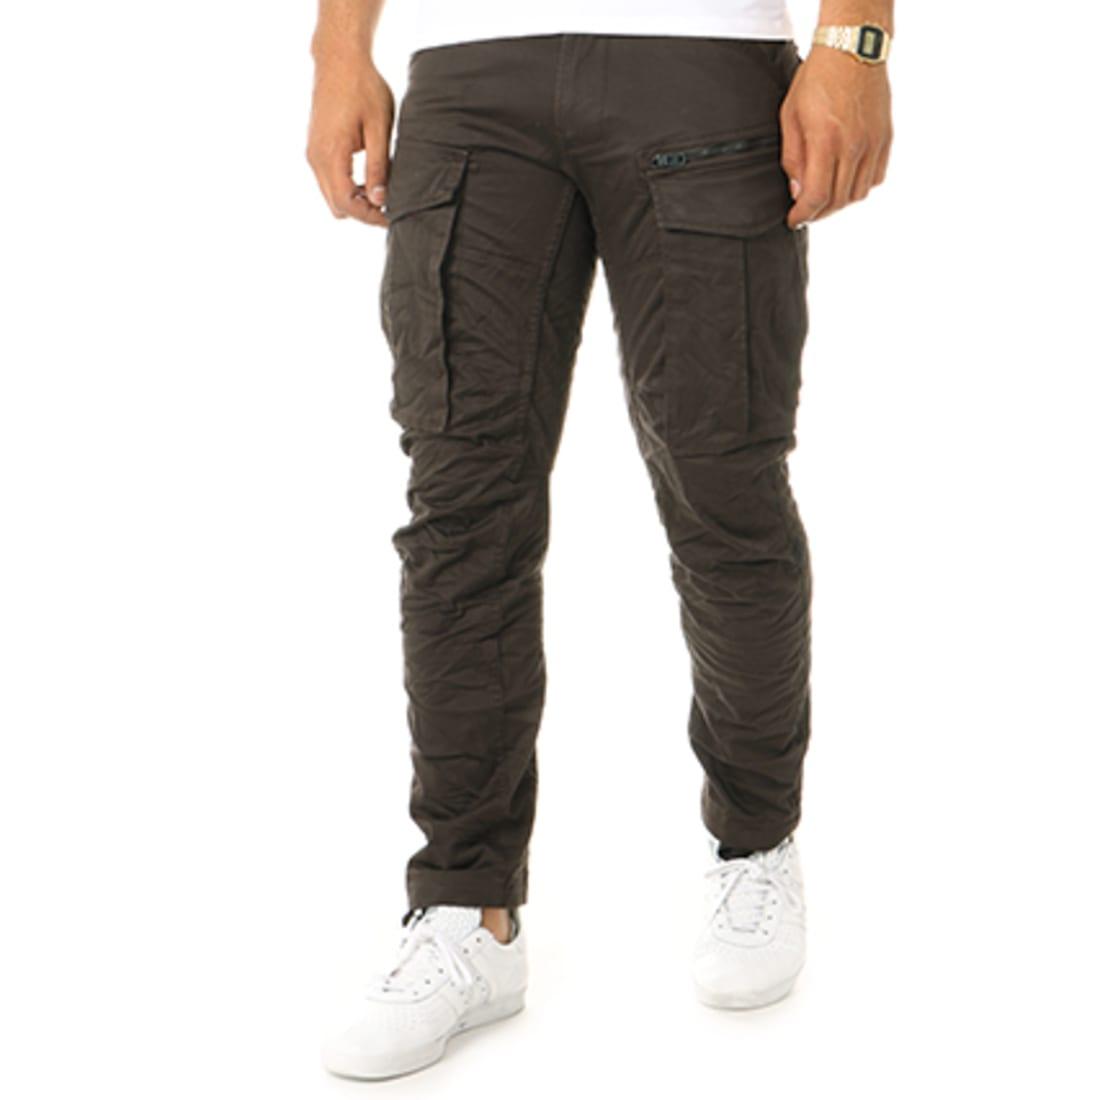 G Star Pantalon Cargo Rovic Zip 3D Tapered D02190 5126